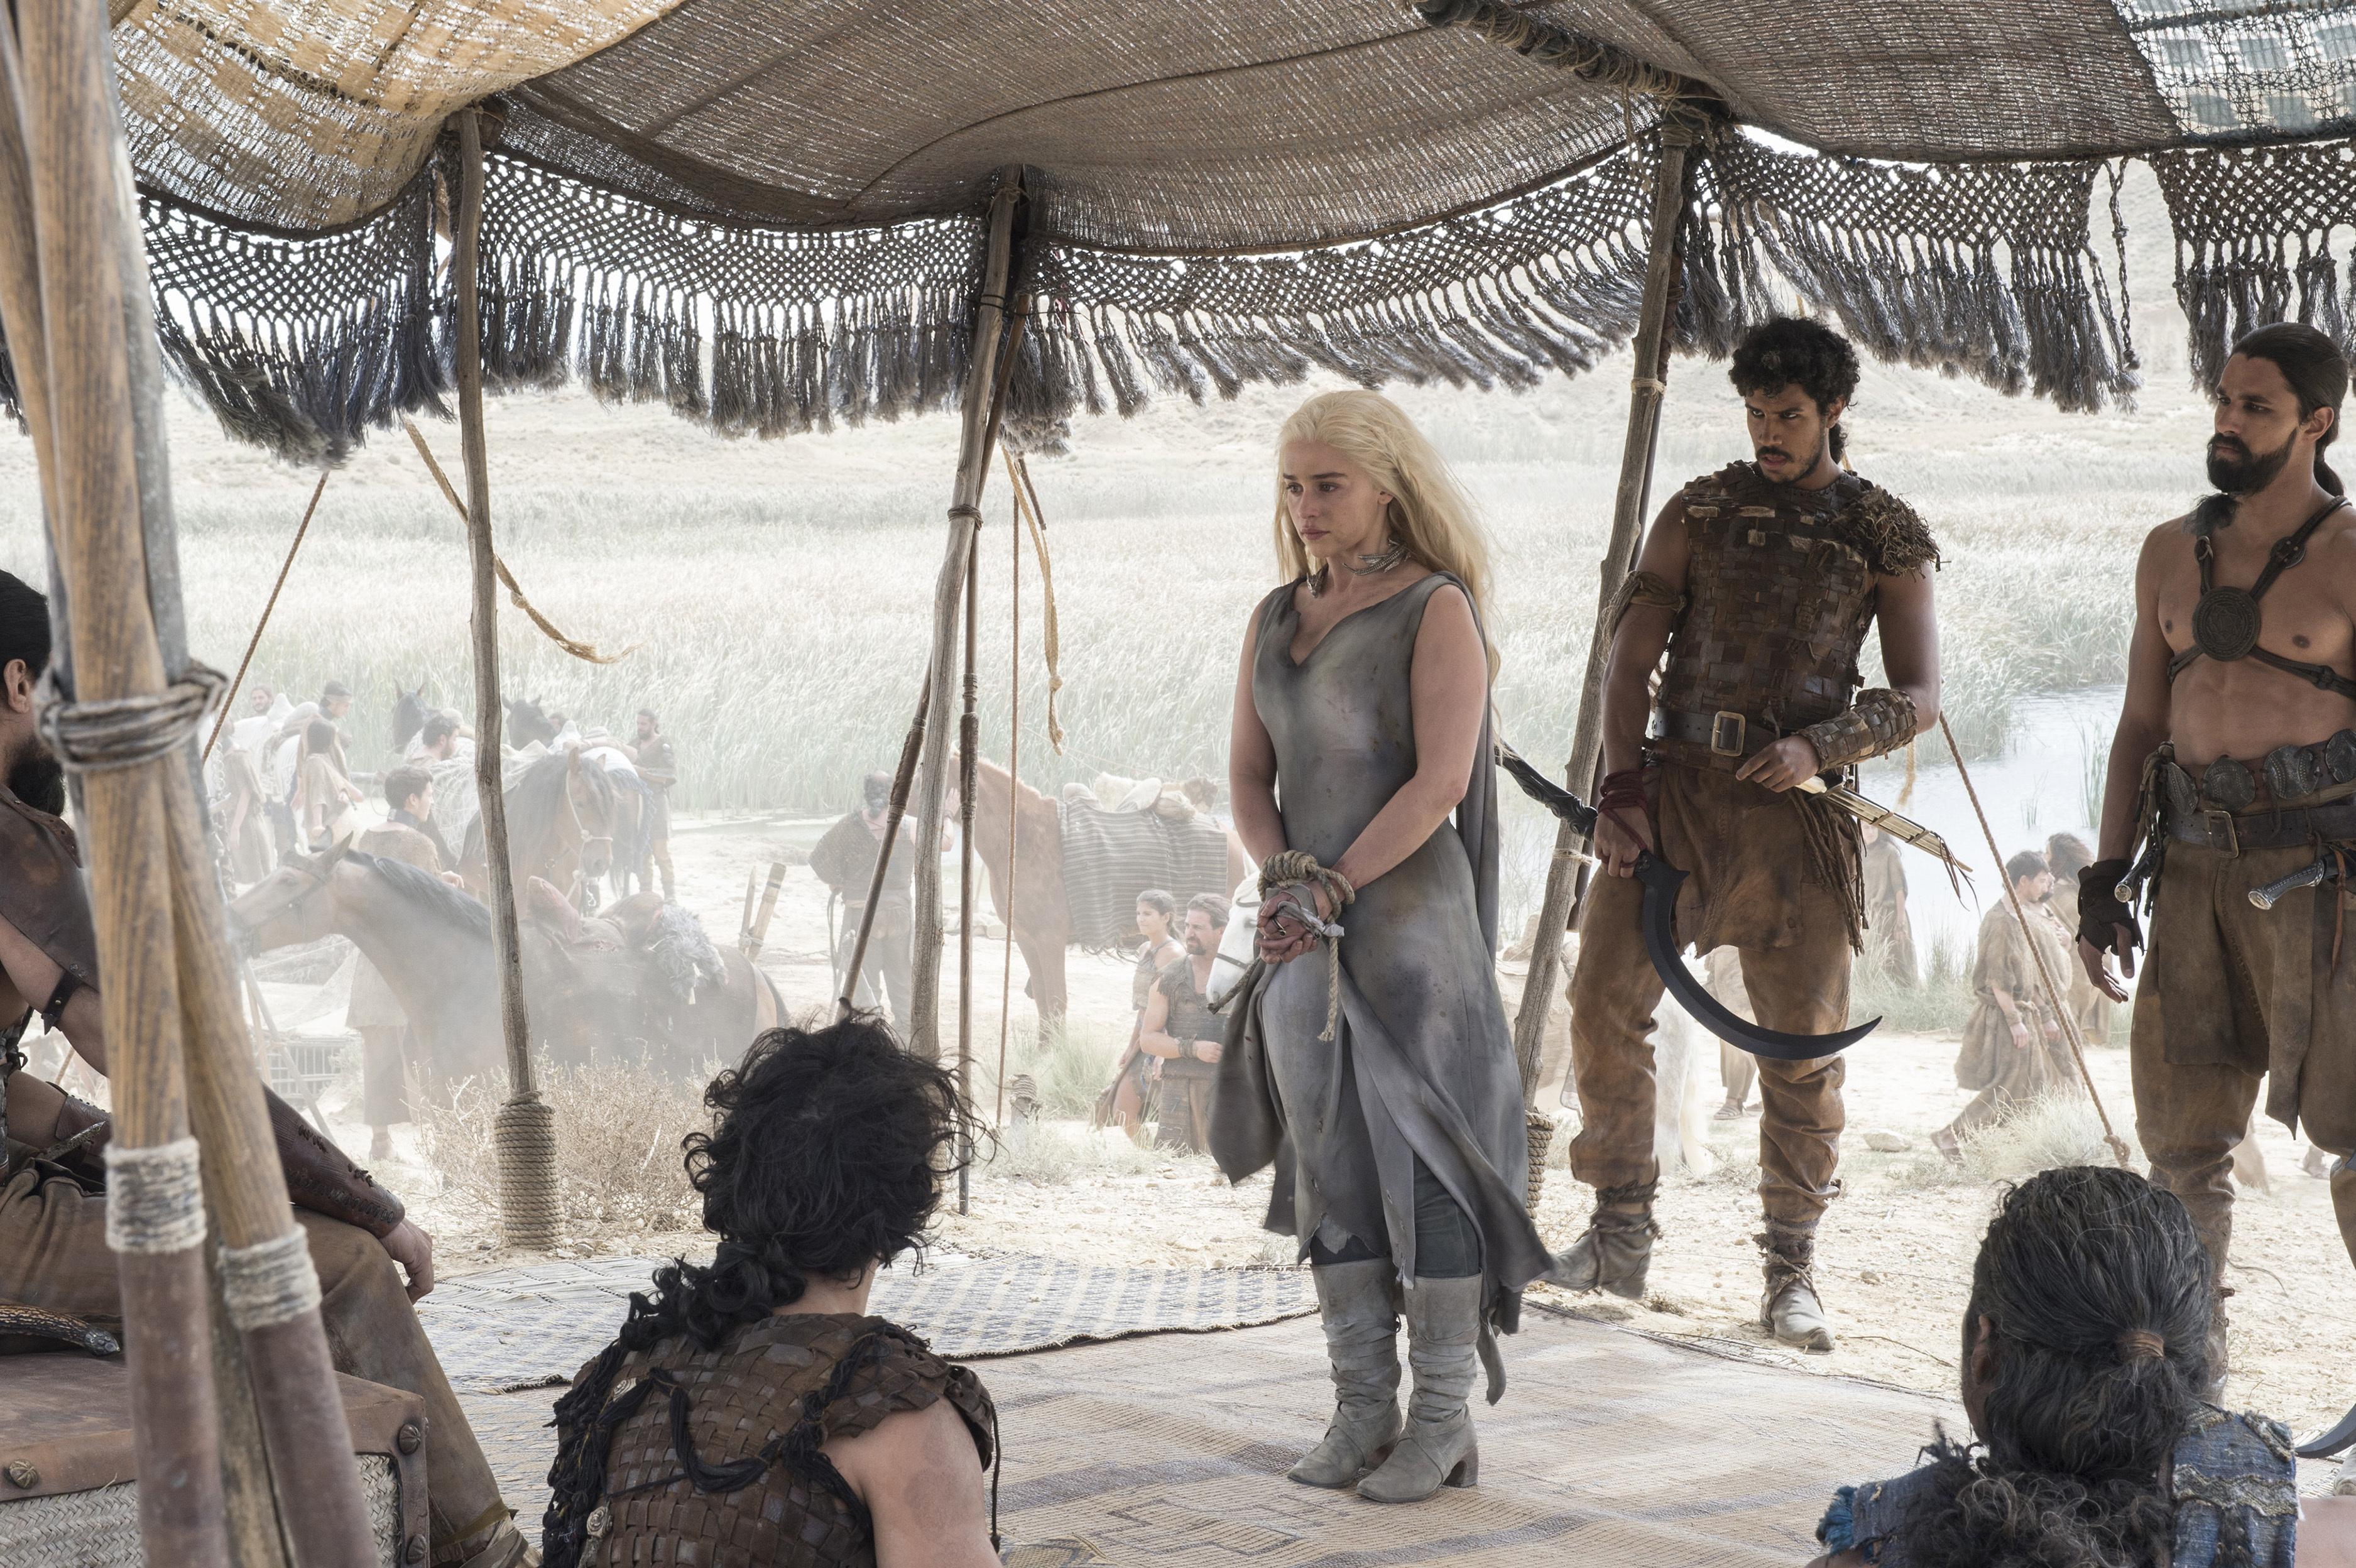 Joseph Naufahu, Junade Khan, Emilia Clarke, Diogo Sales, Chuku Modu, and Staz Nair in Game of Thrones (2011)